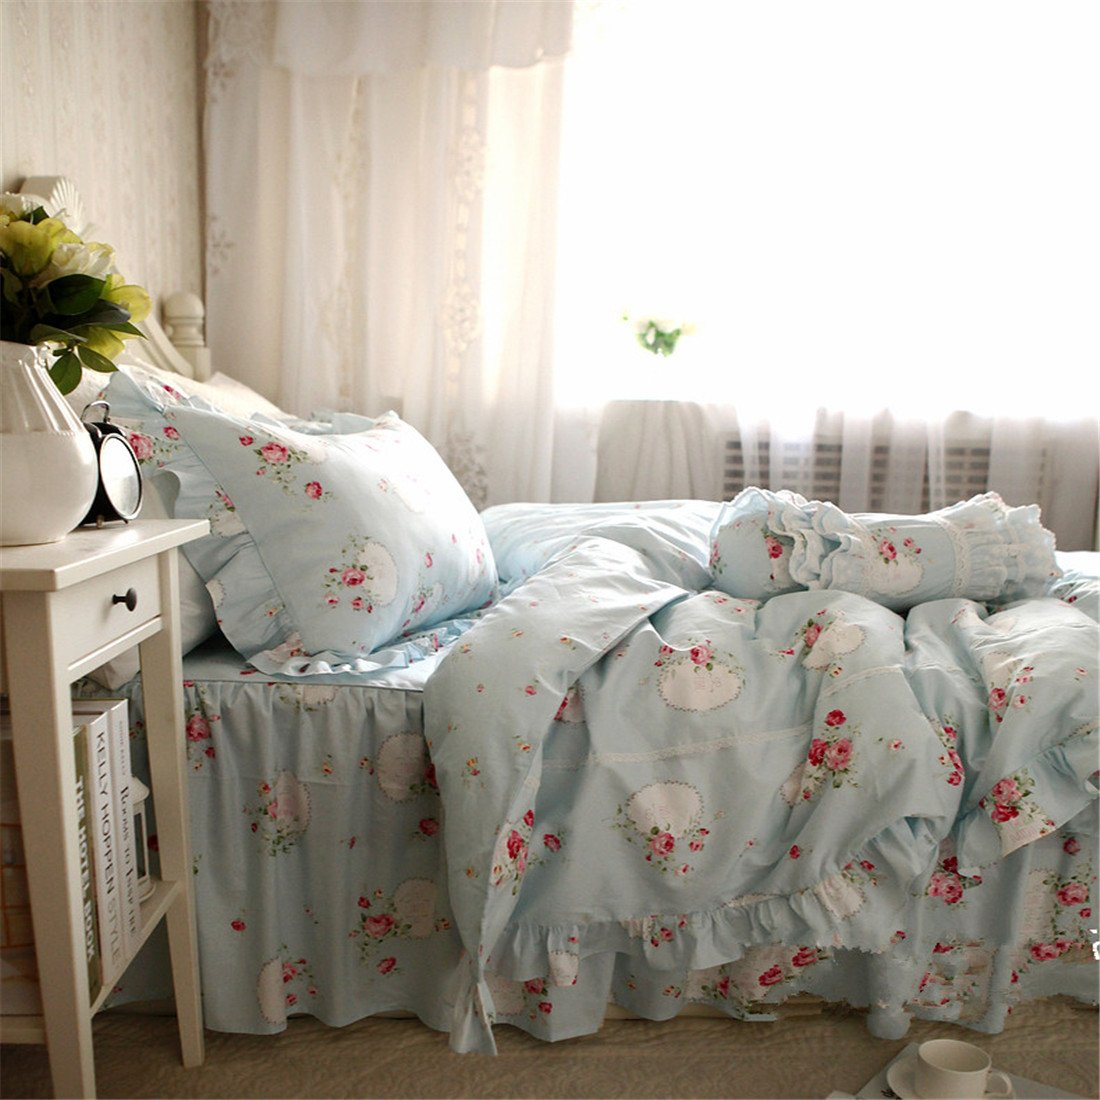 Lotus Karen 100%Cotton Blue Pastoral Flowers 4PC Floral Bed Sheet Set Ruffles Korean Bedding Set With Romantic Love Letters Patterns For Wedding Bedding King,1Duvet Cover,1Bedskirt,2Pillowcases by Lotus Karen (Image #2)